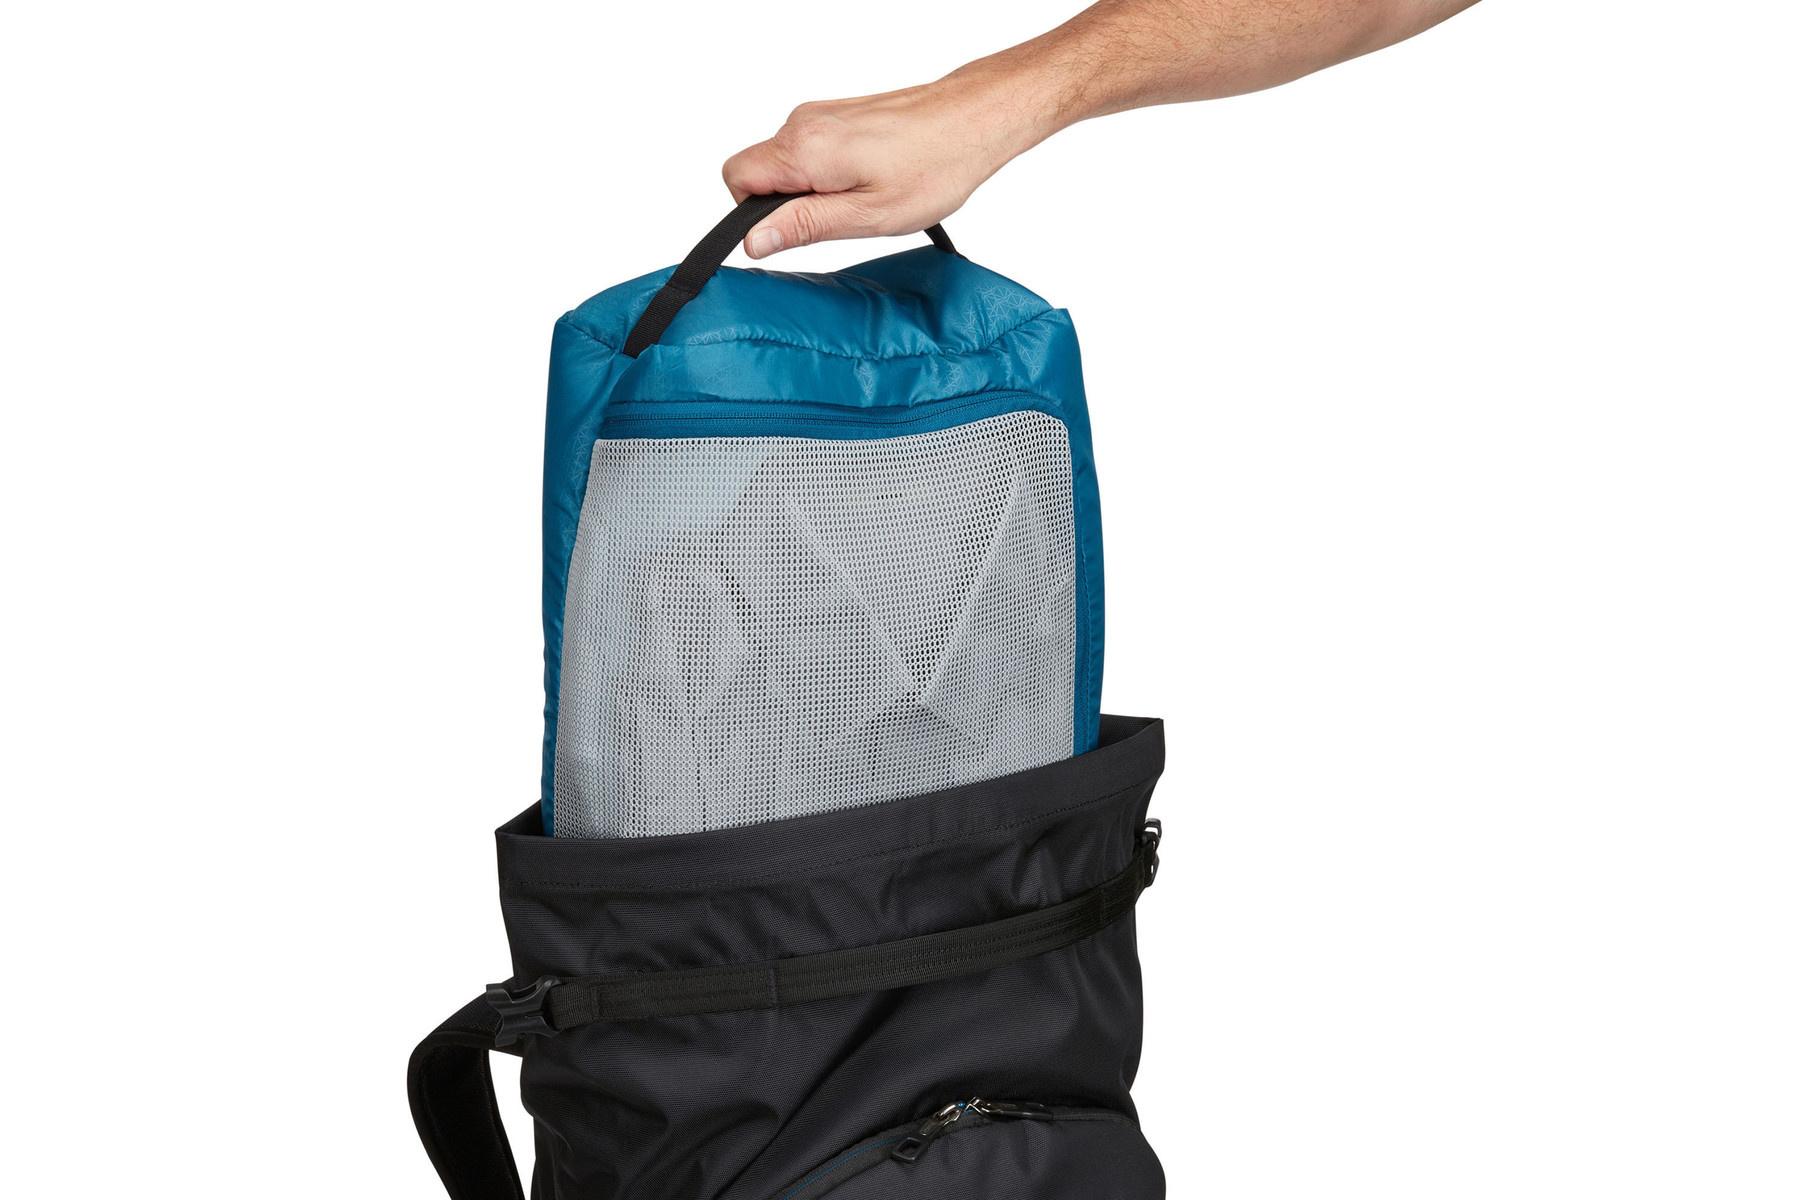 Thule Subterra Travel Backpack 34L